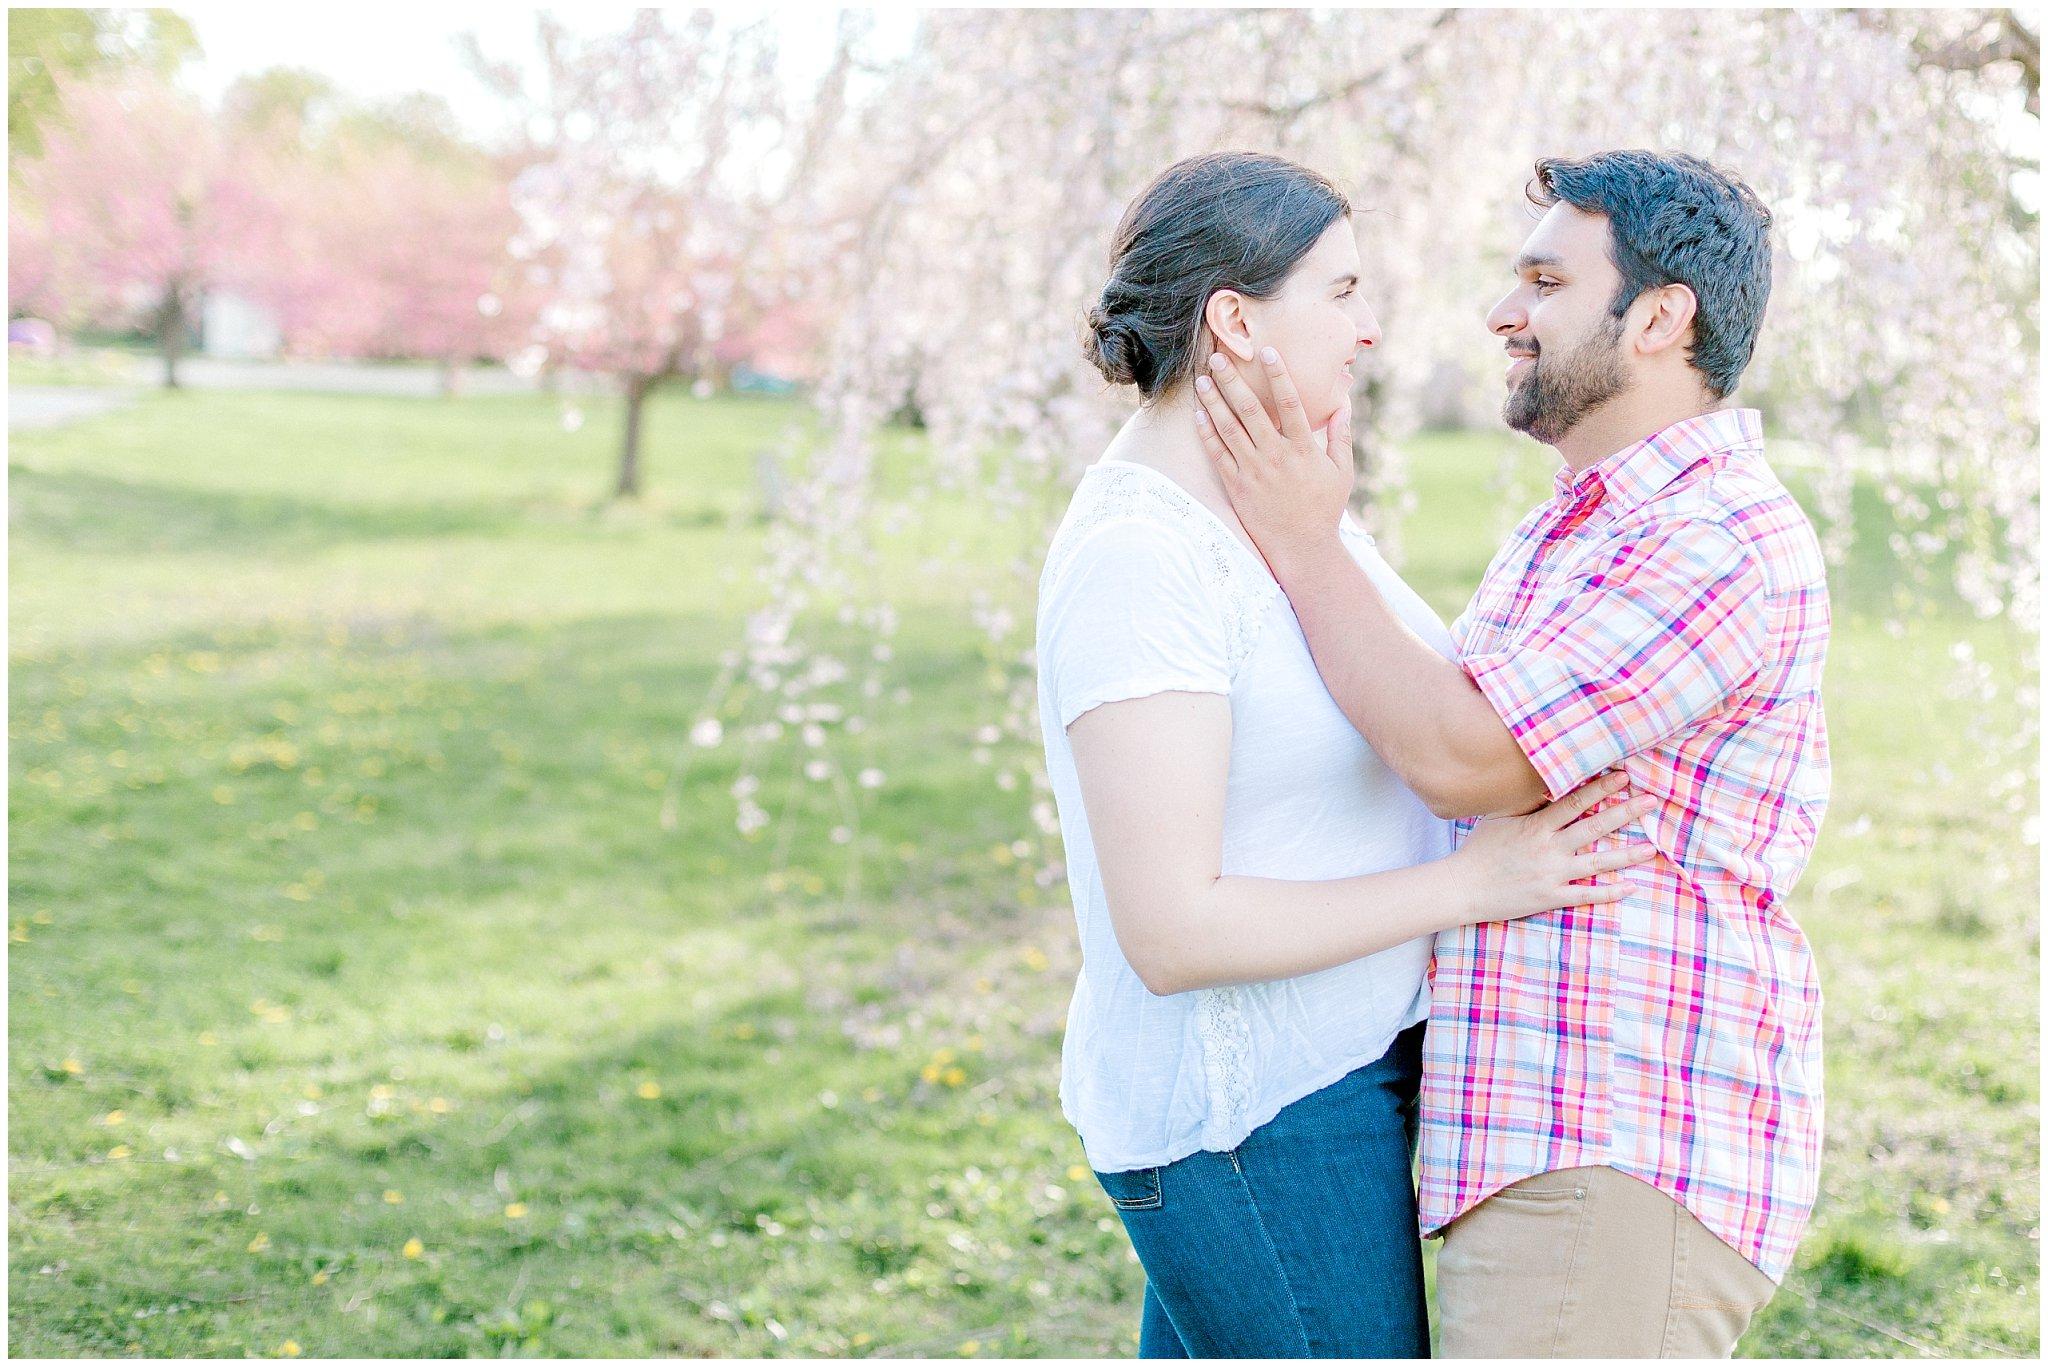 Lehigh Valley Spring Cherry Blossom Engagement Session Pennsylvania Wedding Photographer (17).jpg